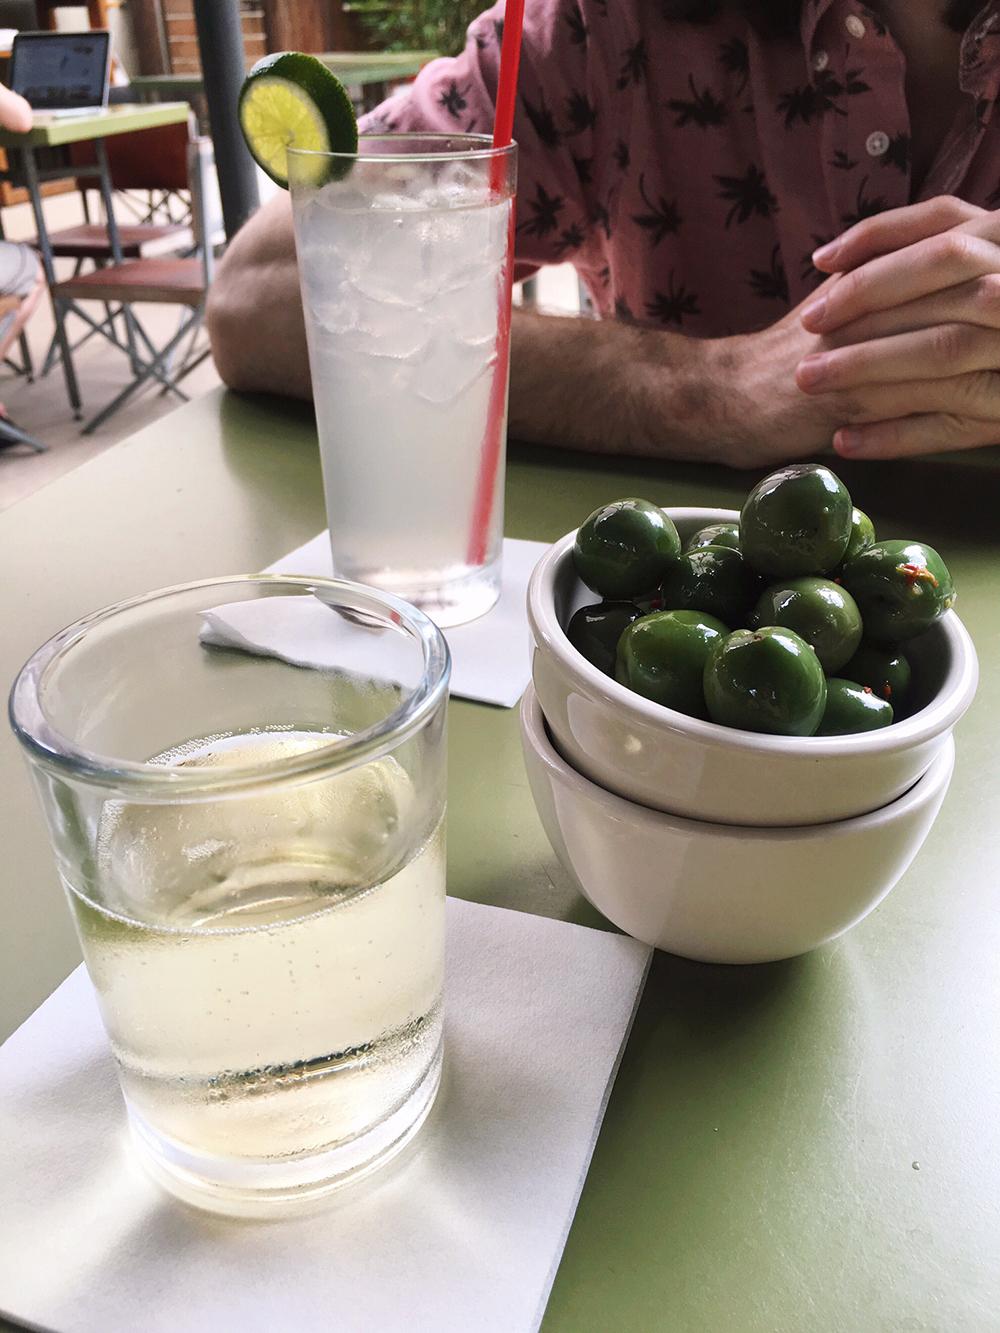 Hotel San Jose Review - Hotel San Jose lounge snacks and drinks Austin, TX